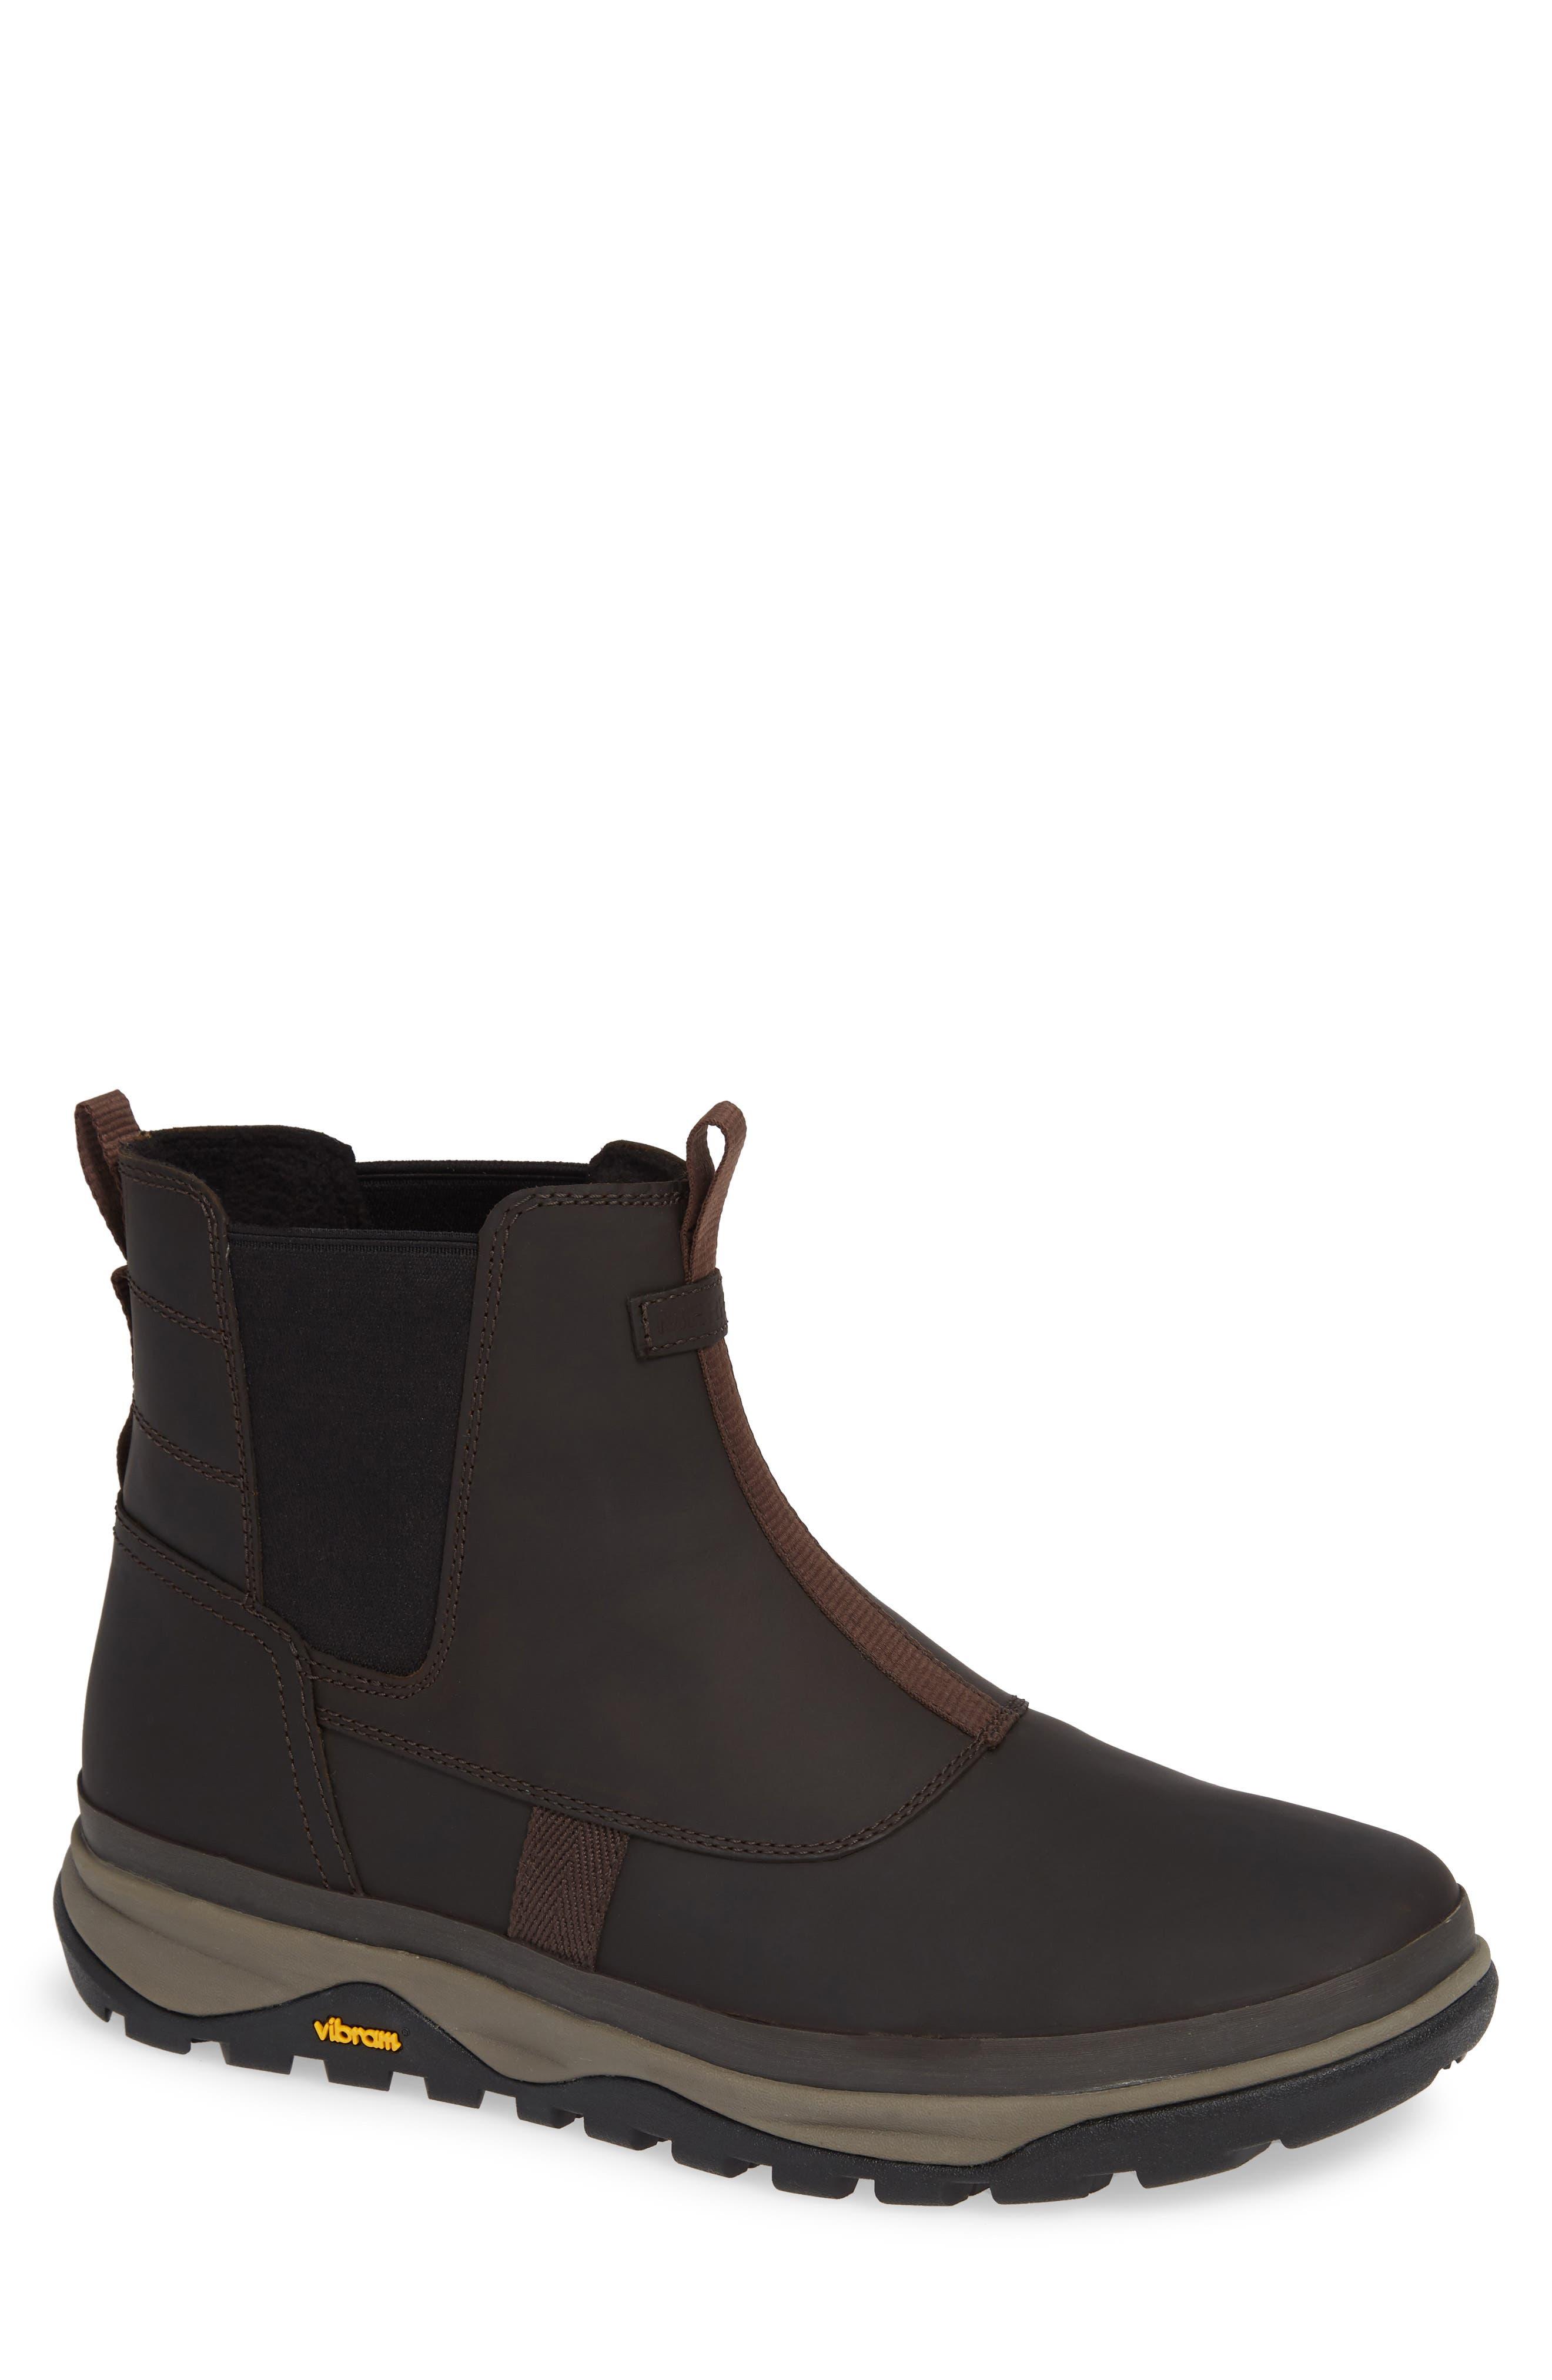 "Image of Merrell Tremblant 6"" Polar Waterproof Boot"